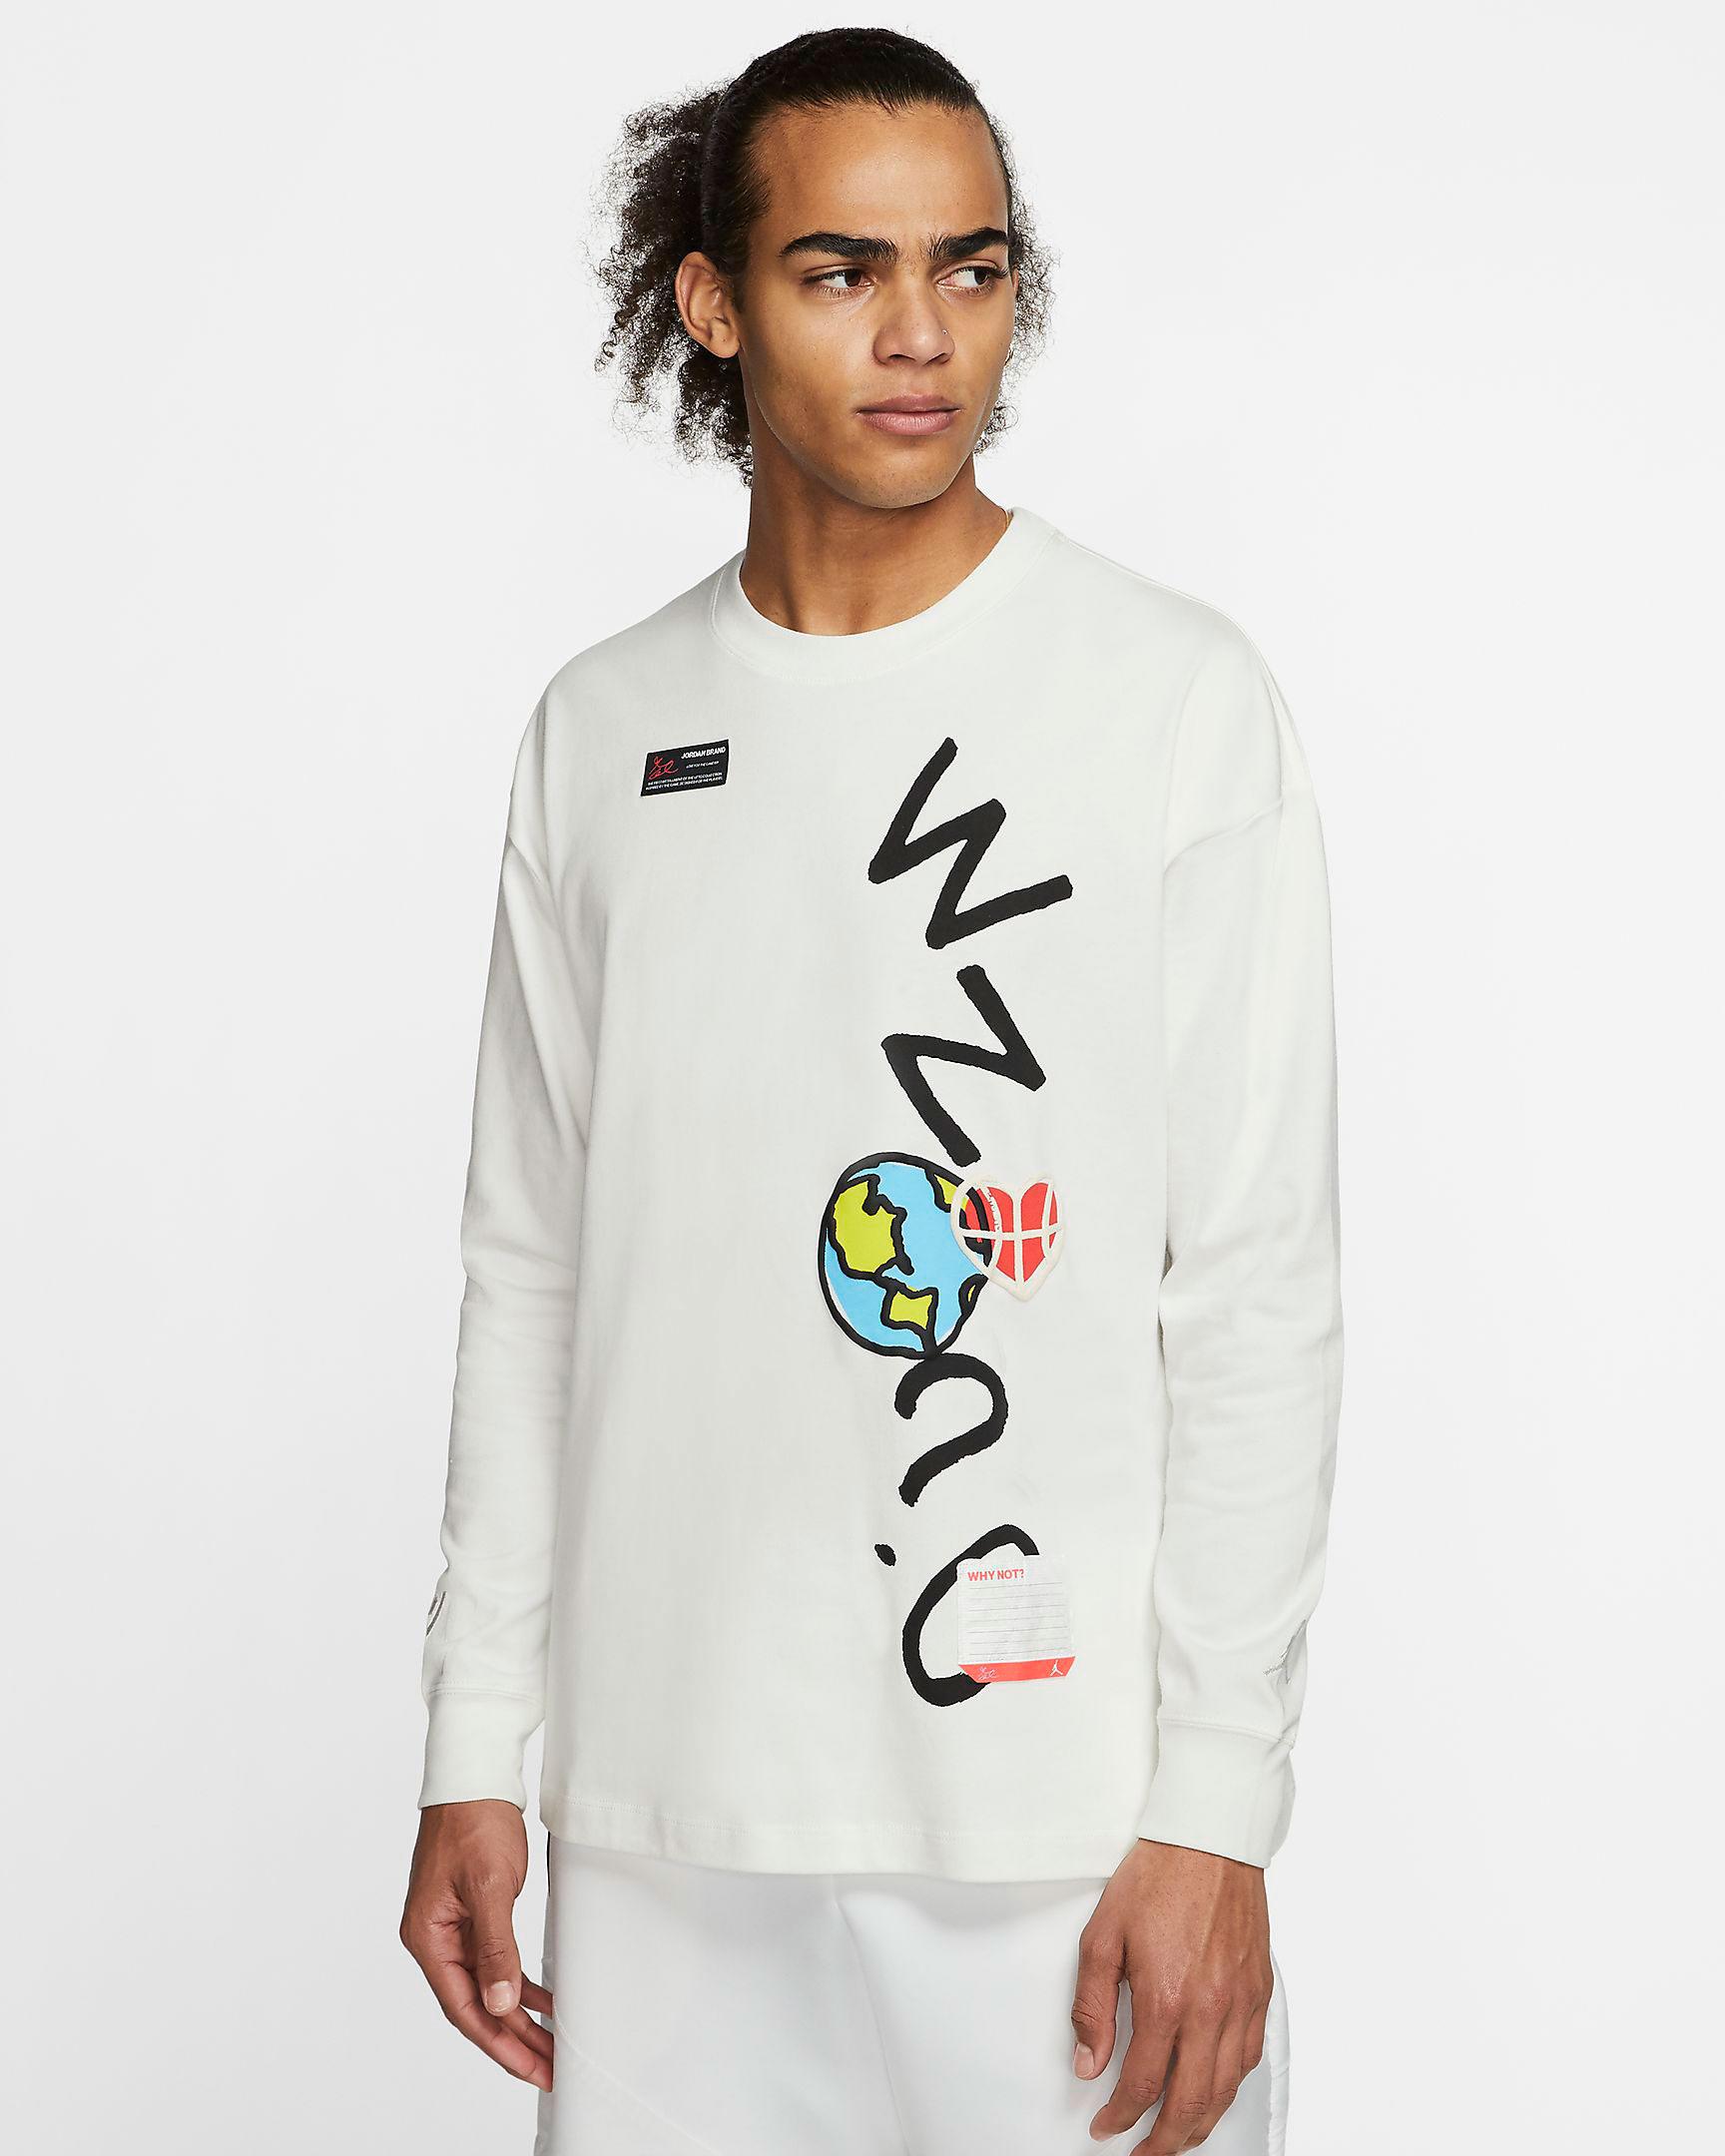 jordan-westbrook-why-not-zer03-long-sleeve-shirt-white-1